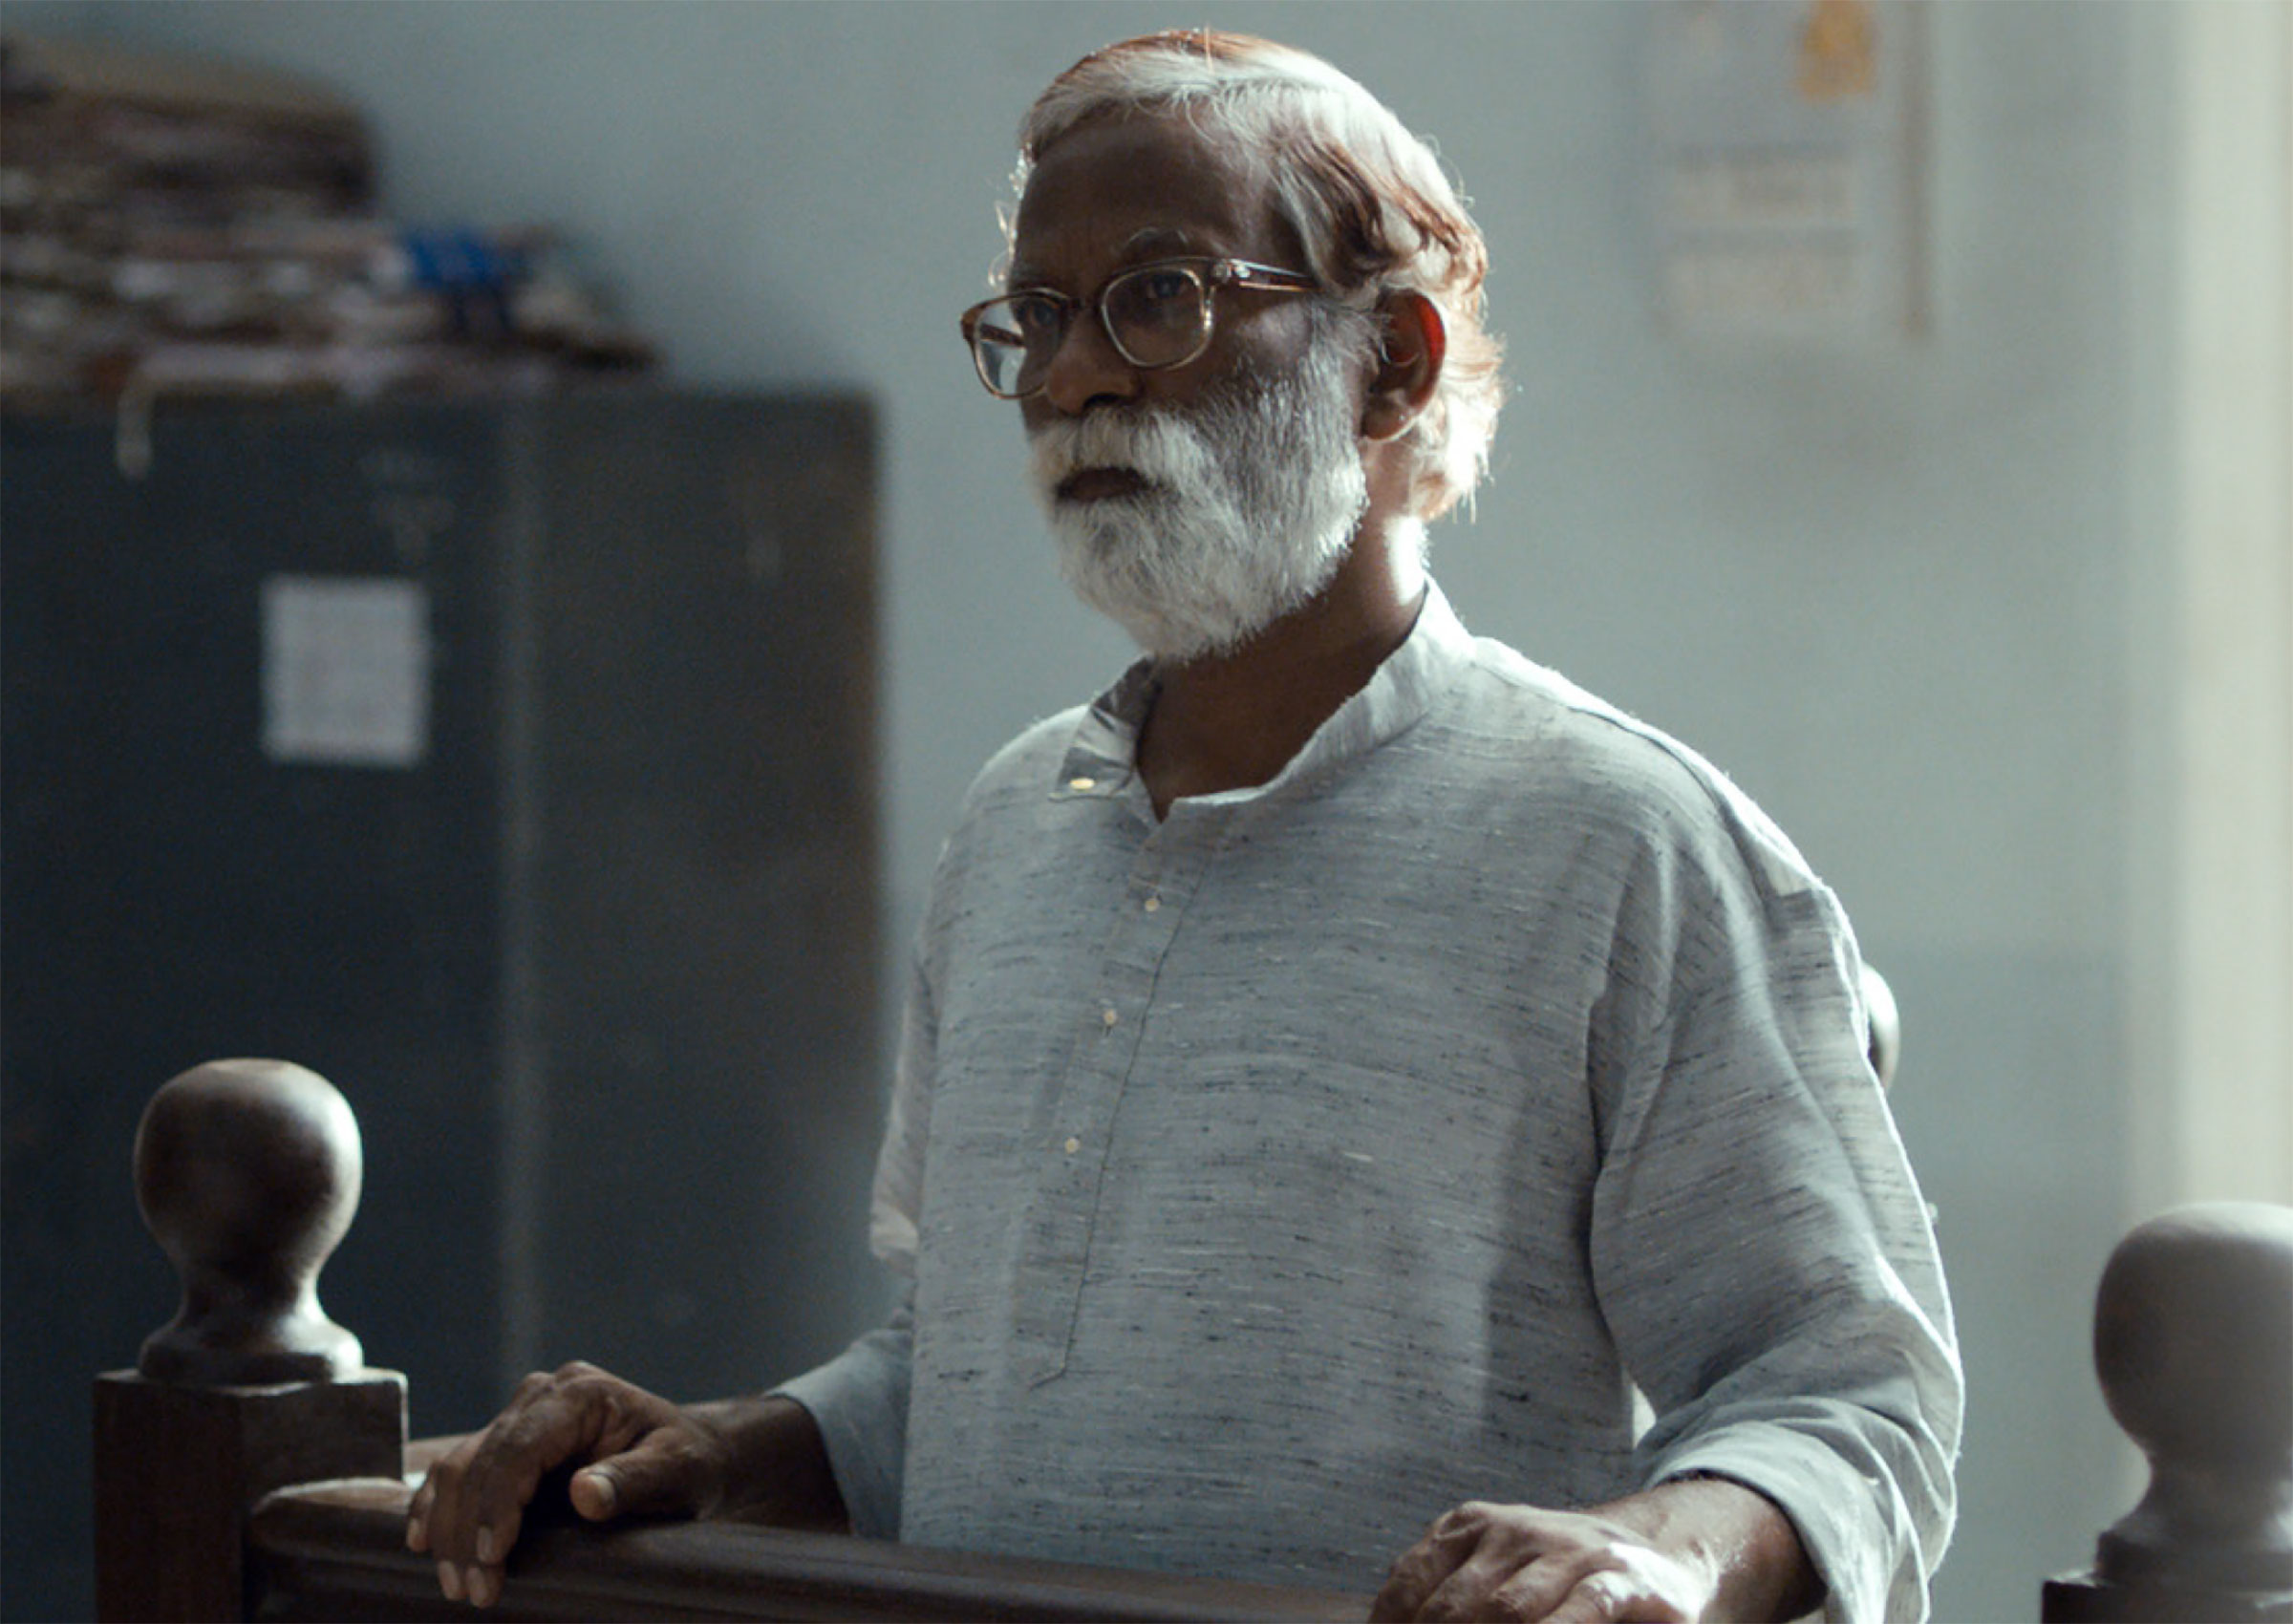 Vira Sathidar in a still from Chaitanya Tamhane's film Court